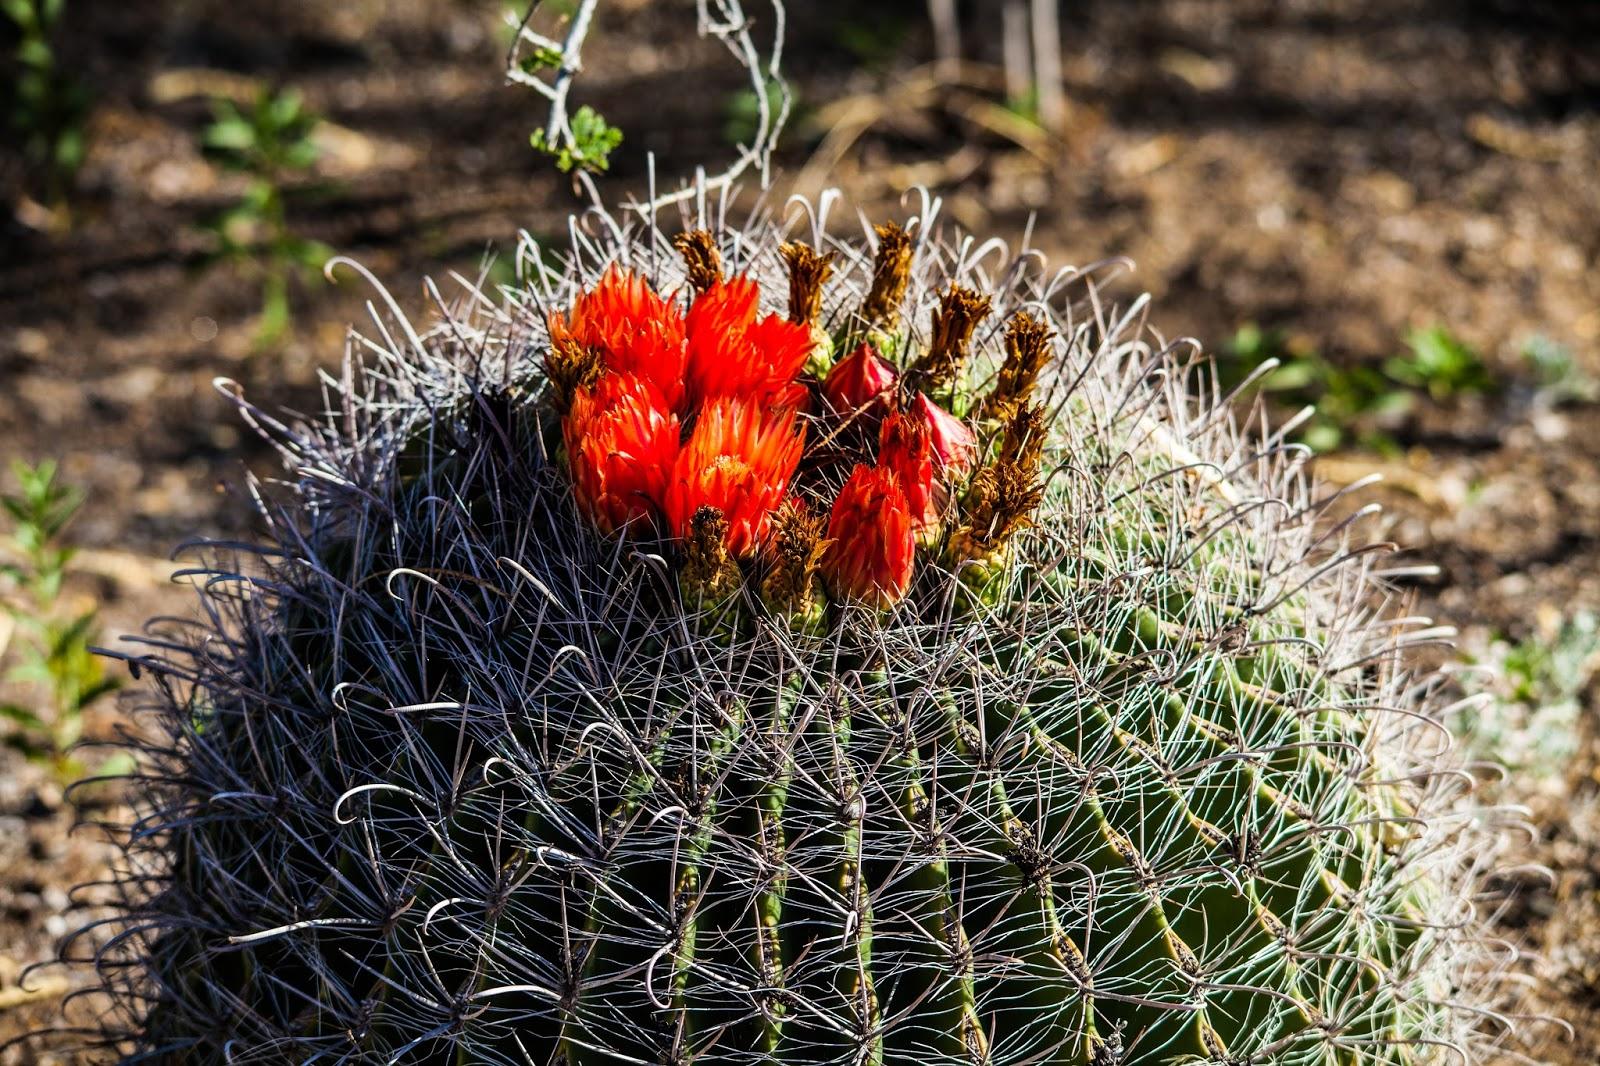 Fishhook barrel cactus walking arizona for Fish hook cactus